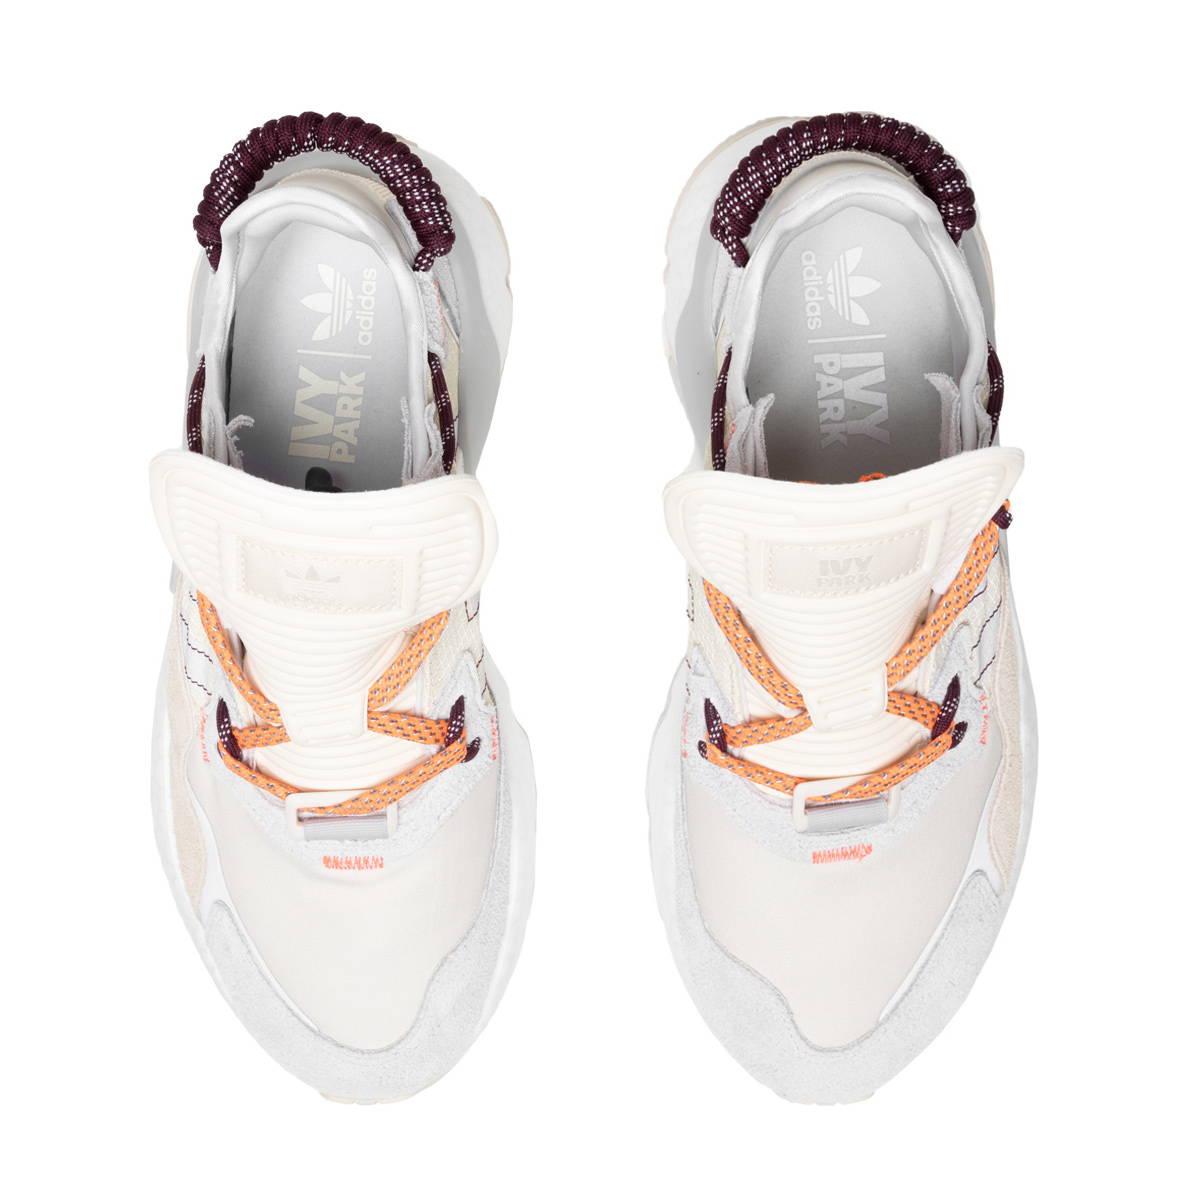 1 18 20 Adidas Ivy Park Nite Jogger Qs Bodega